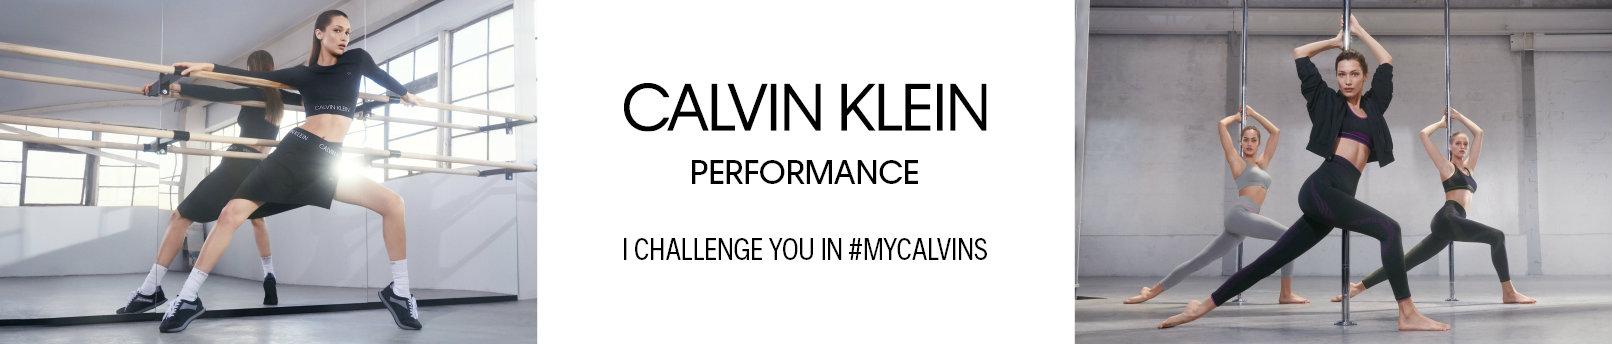 Scopri CK Performance